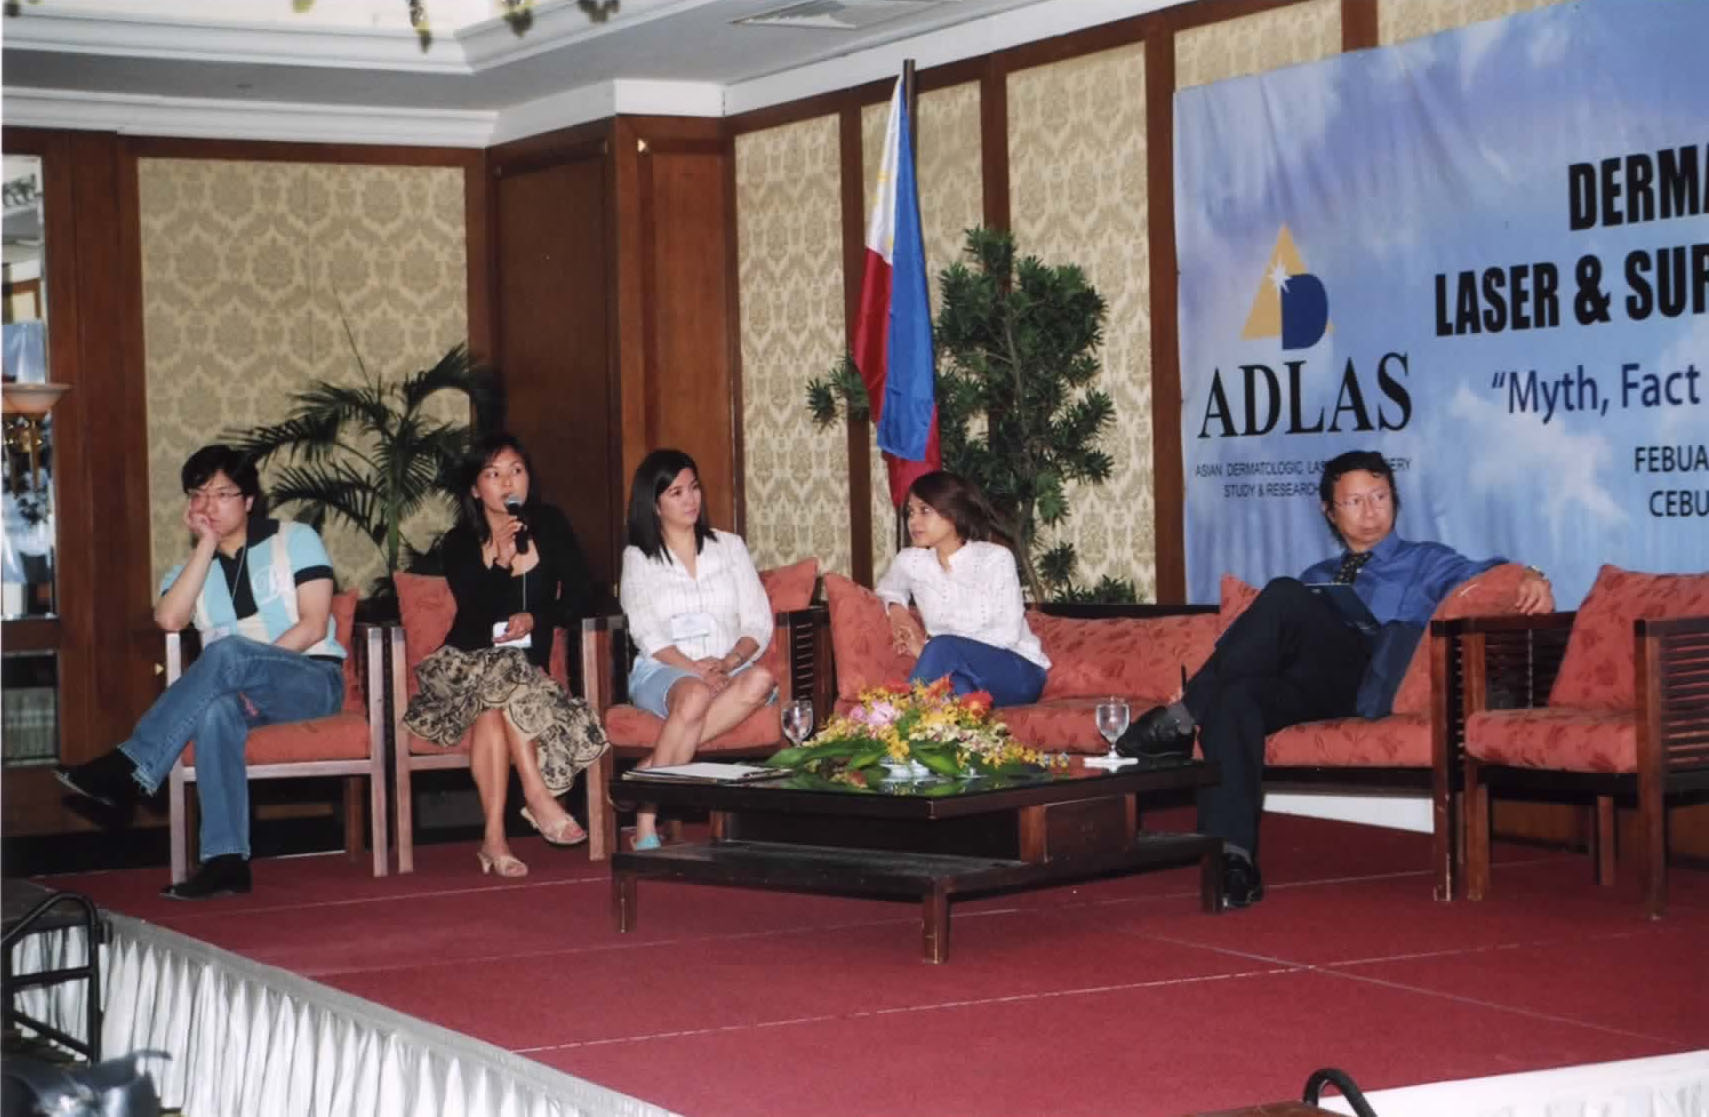 2005 -Cebu - Asian Dermatologic Lasers And Surgery Conference